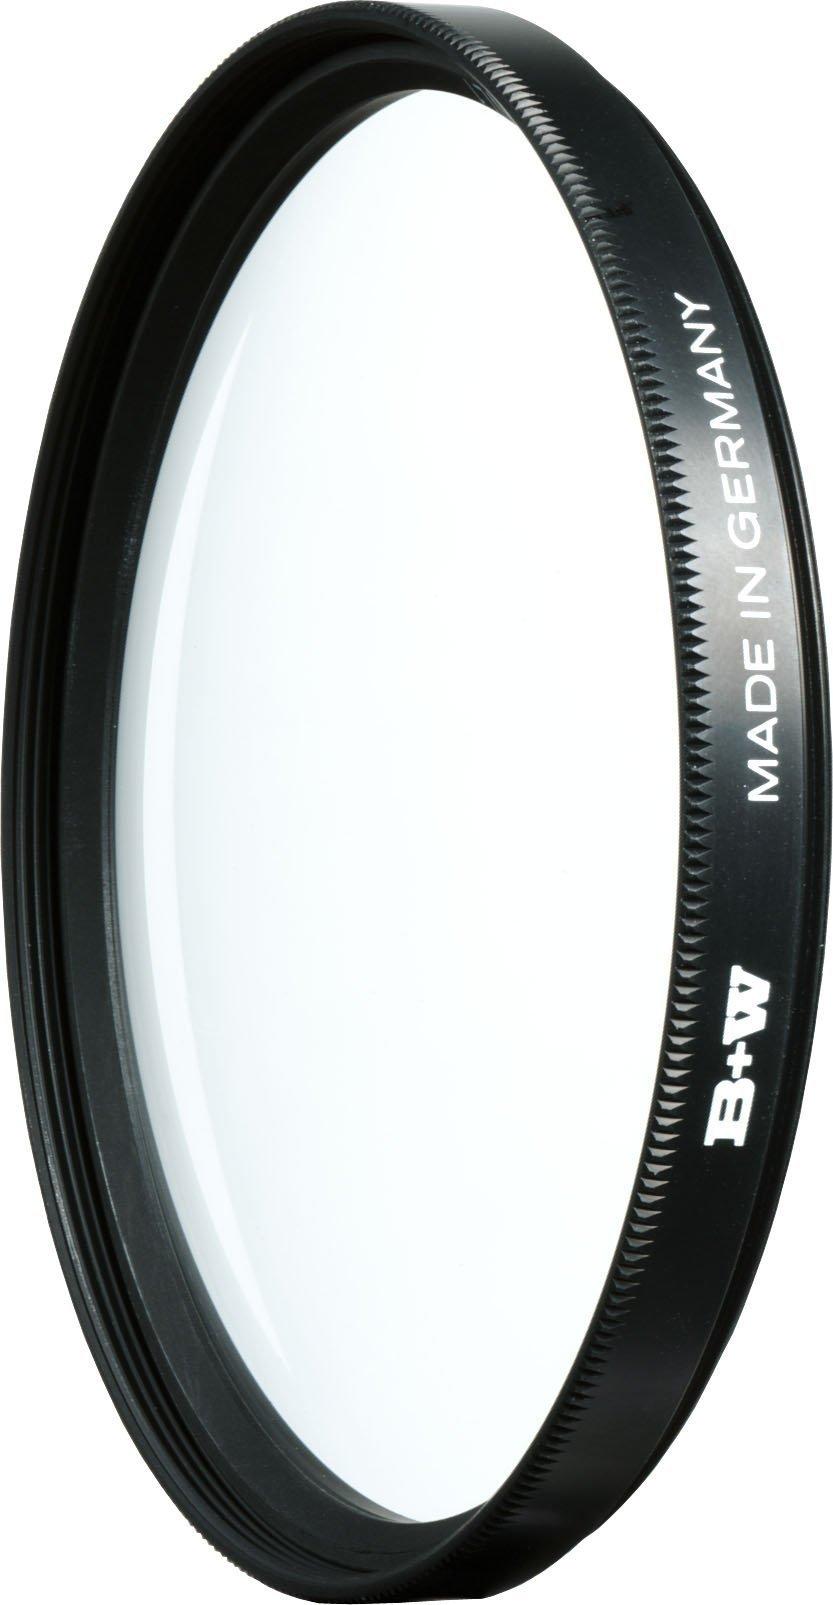 B+W 86mm Clear UV Haze with Multi-Resistant Coating (010M) by B+W